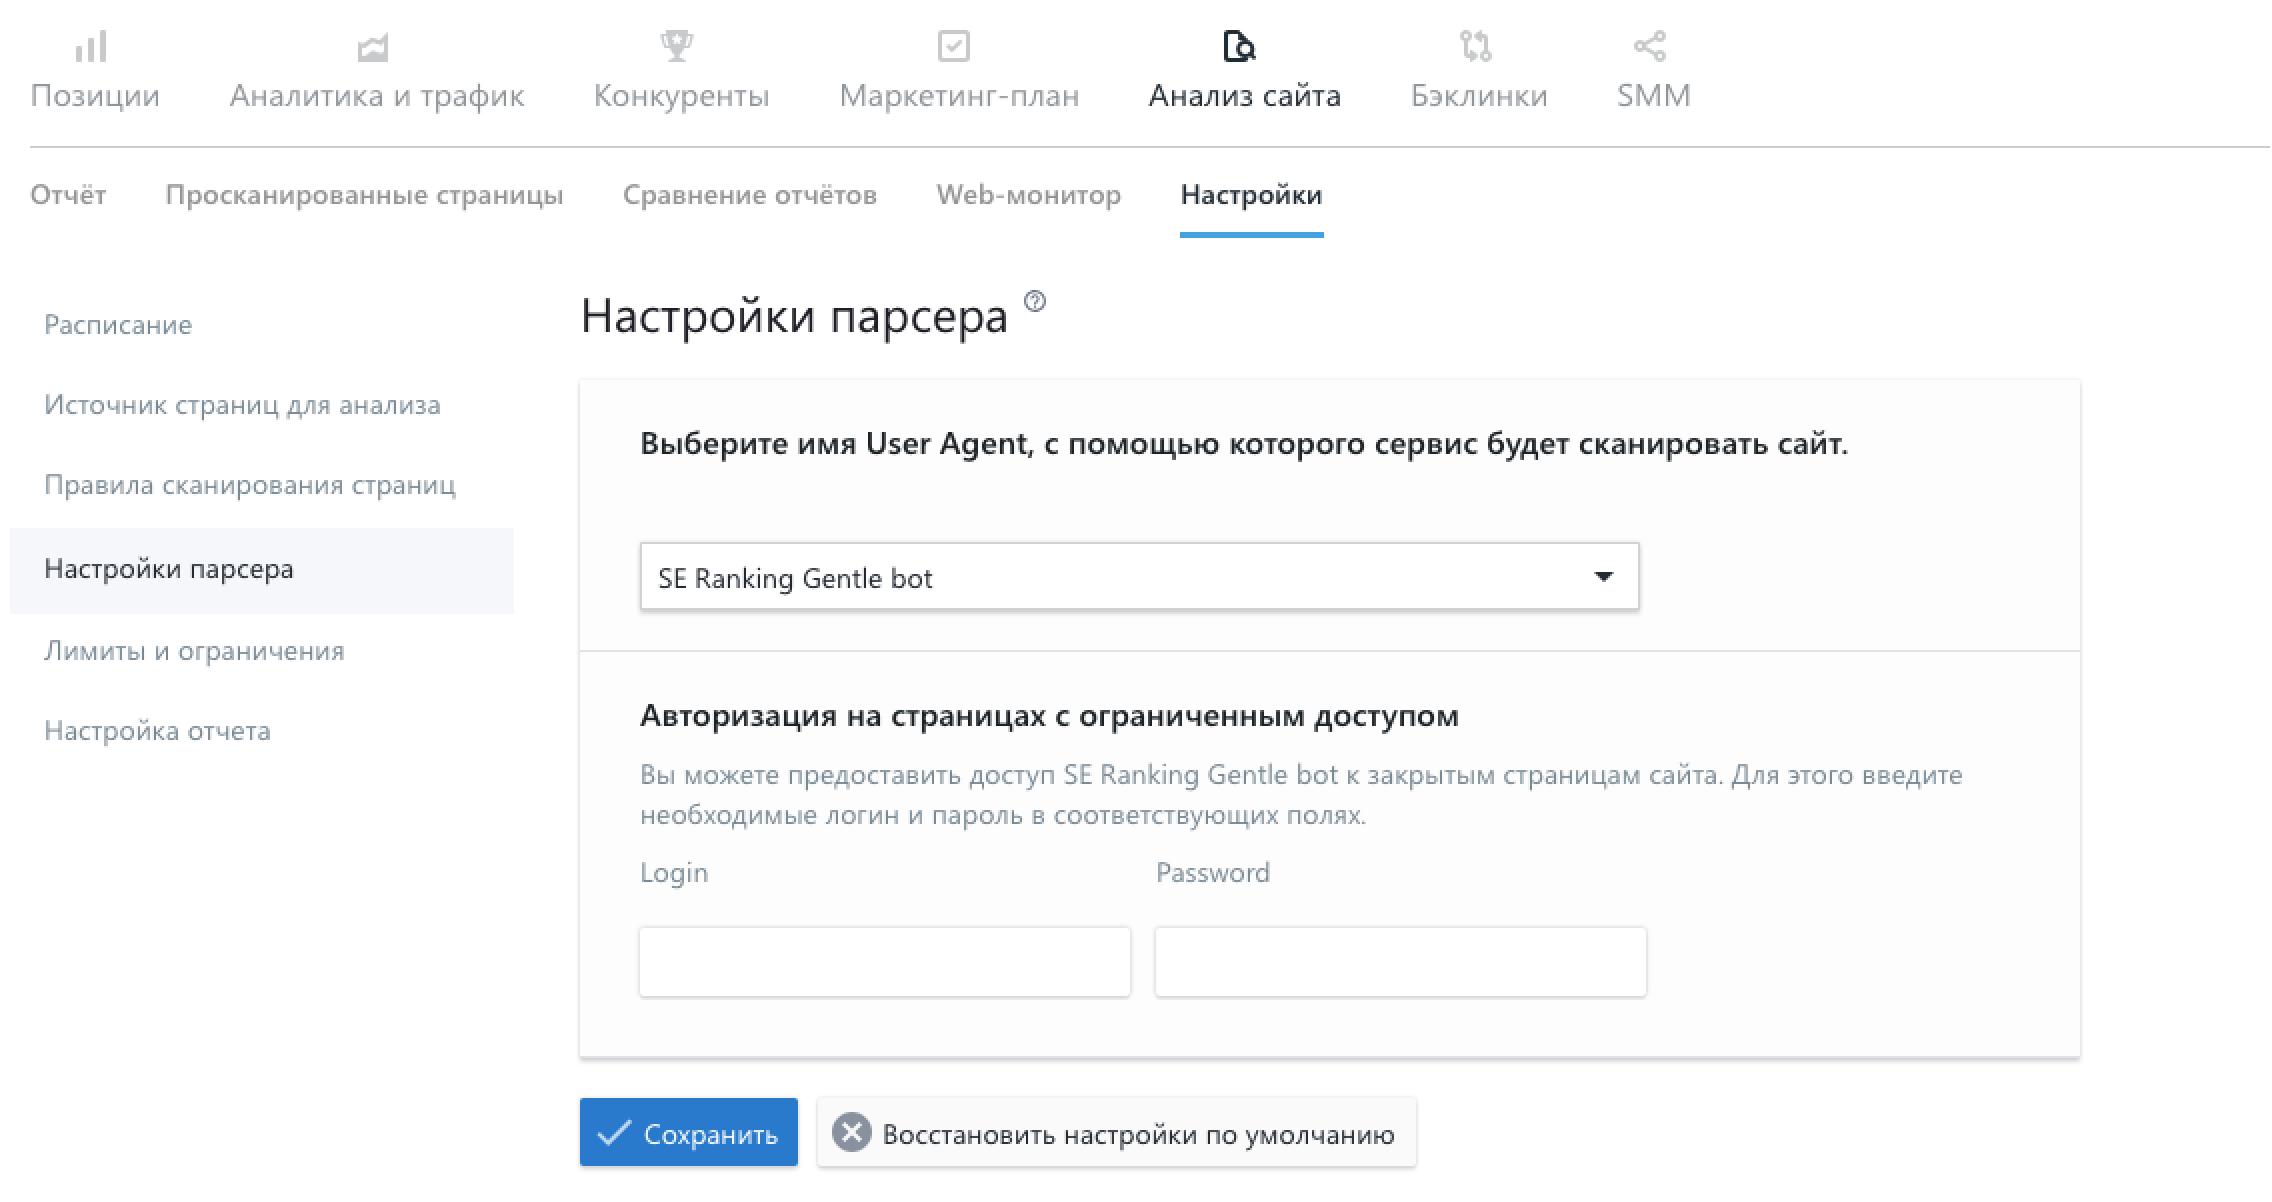 Настройка парсера для Анализа сайта в SE Ranking